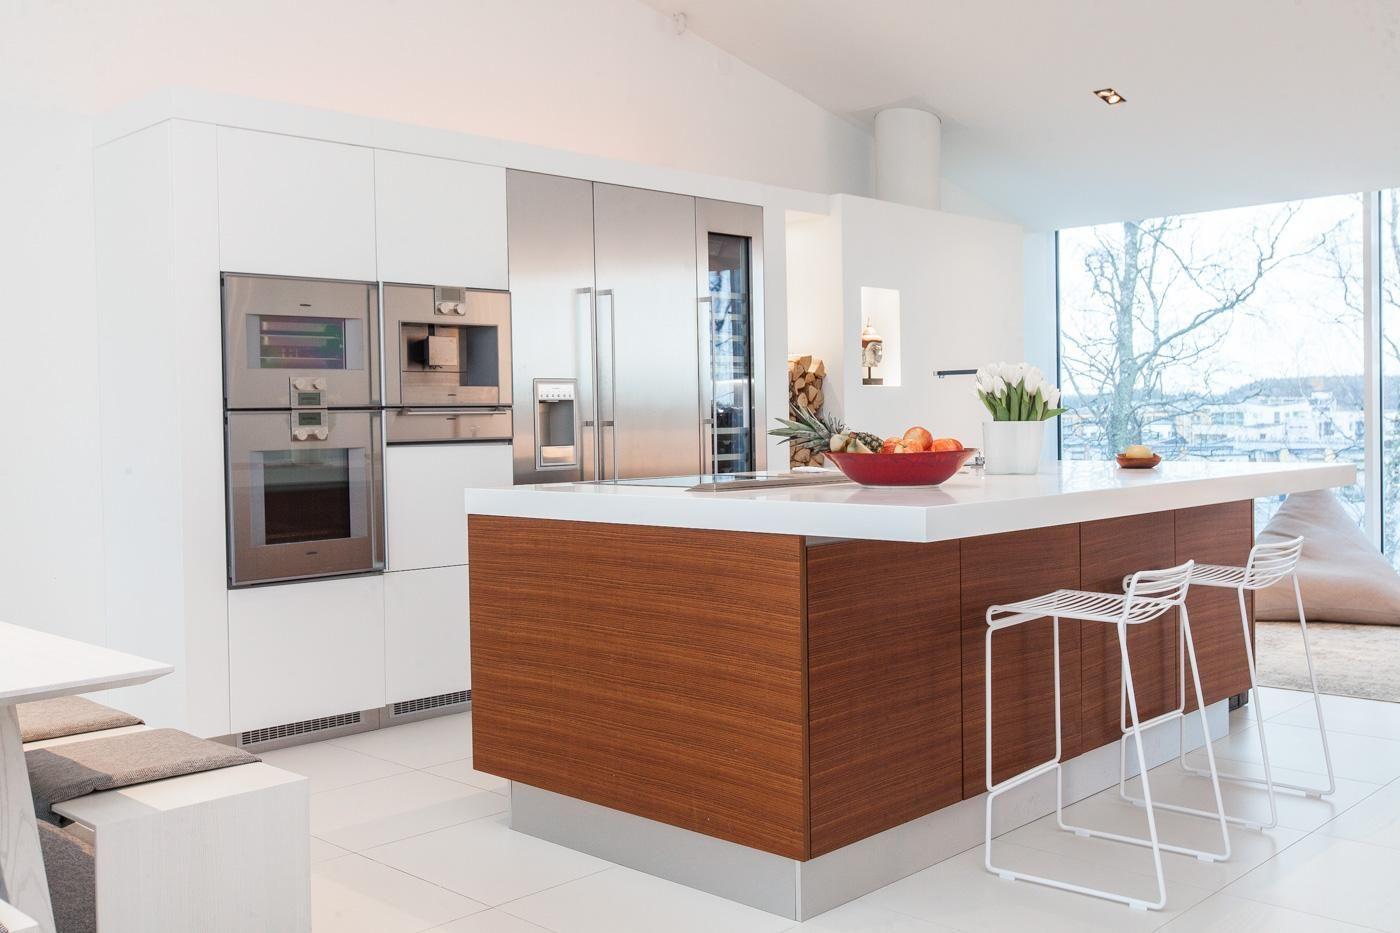 Moderni keittiö, Etuovi.com Asunnot, 56993729e4b09002ed1513cd - Etuovi.com Sisustus